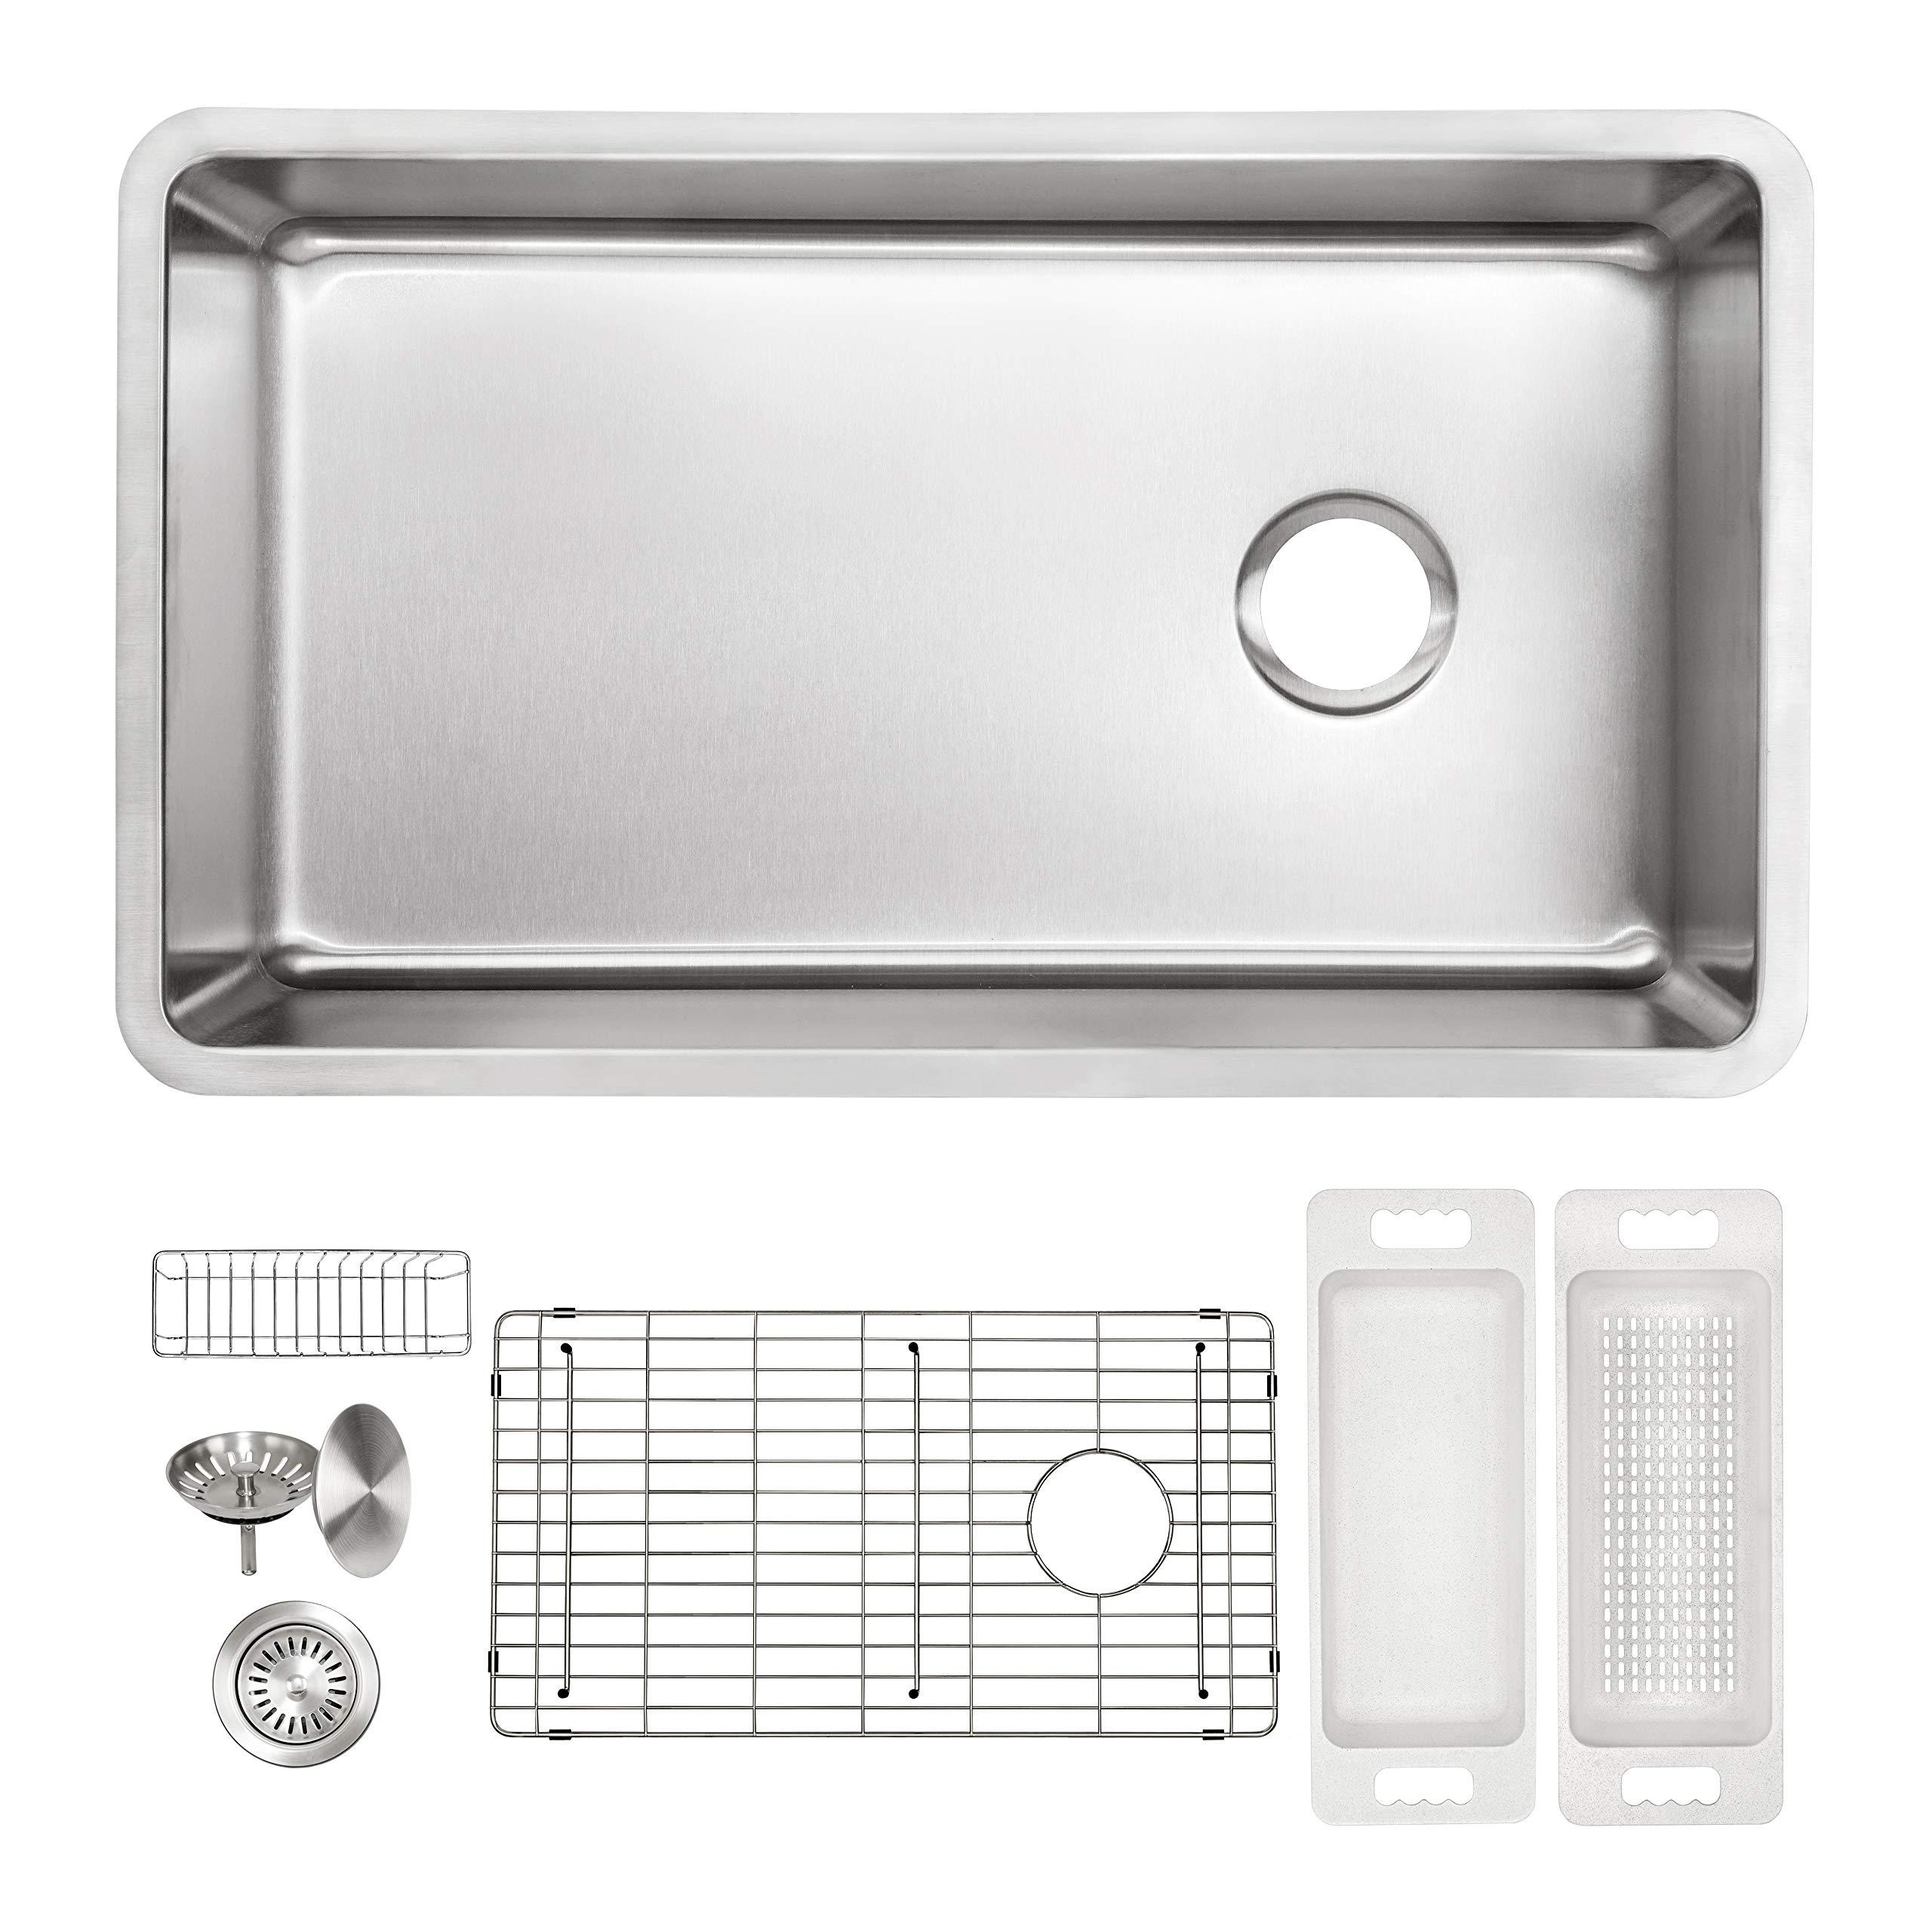 ZUHNE 16G Offset Drain Stainless Steel Kitchen Sink Fits 36'' Cabinet (32 x 19 Inch Single Under Mount) by Zuhne